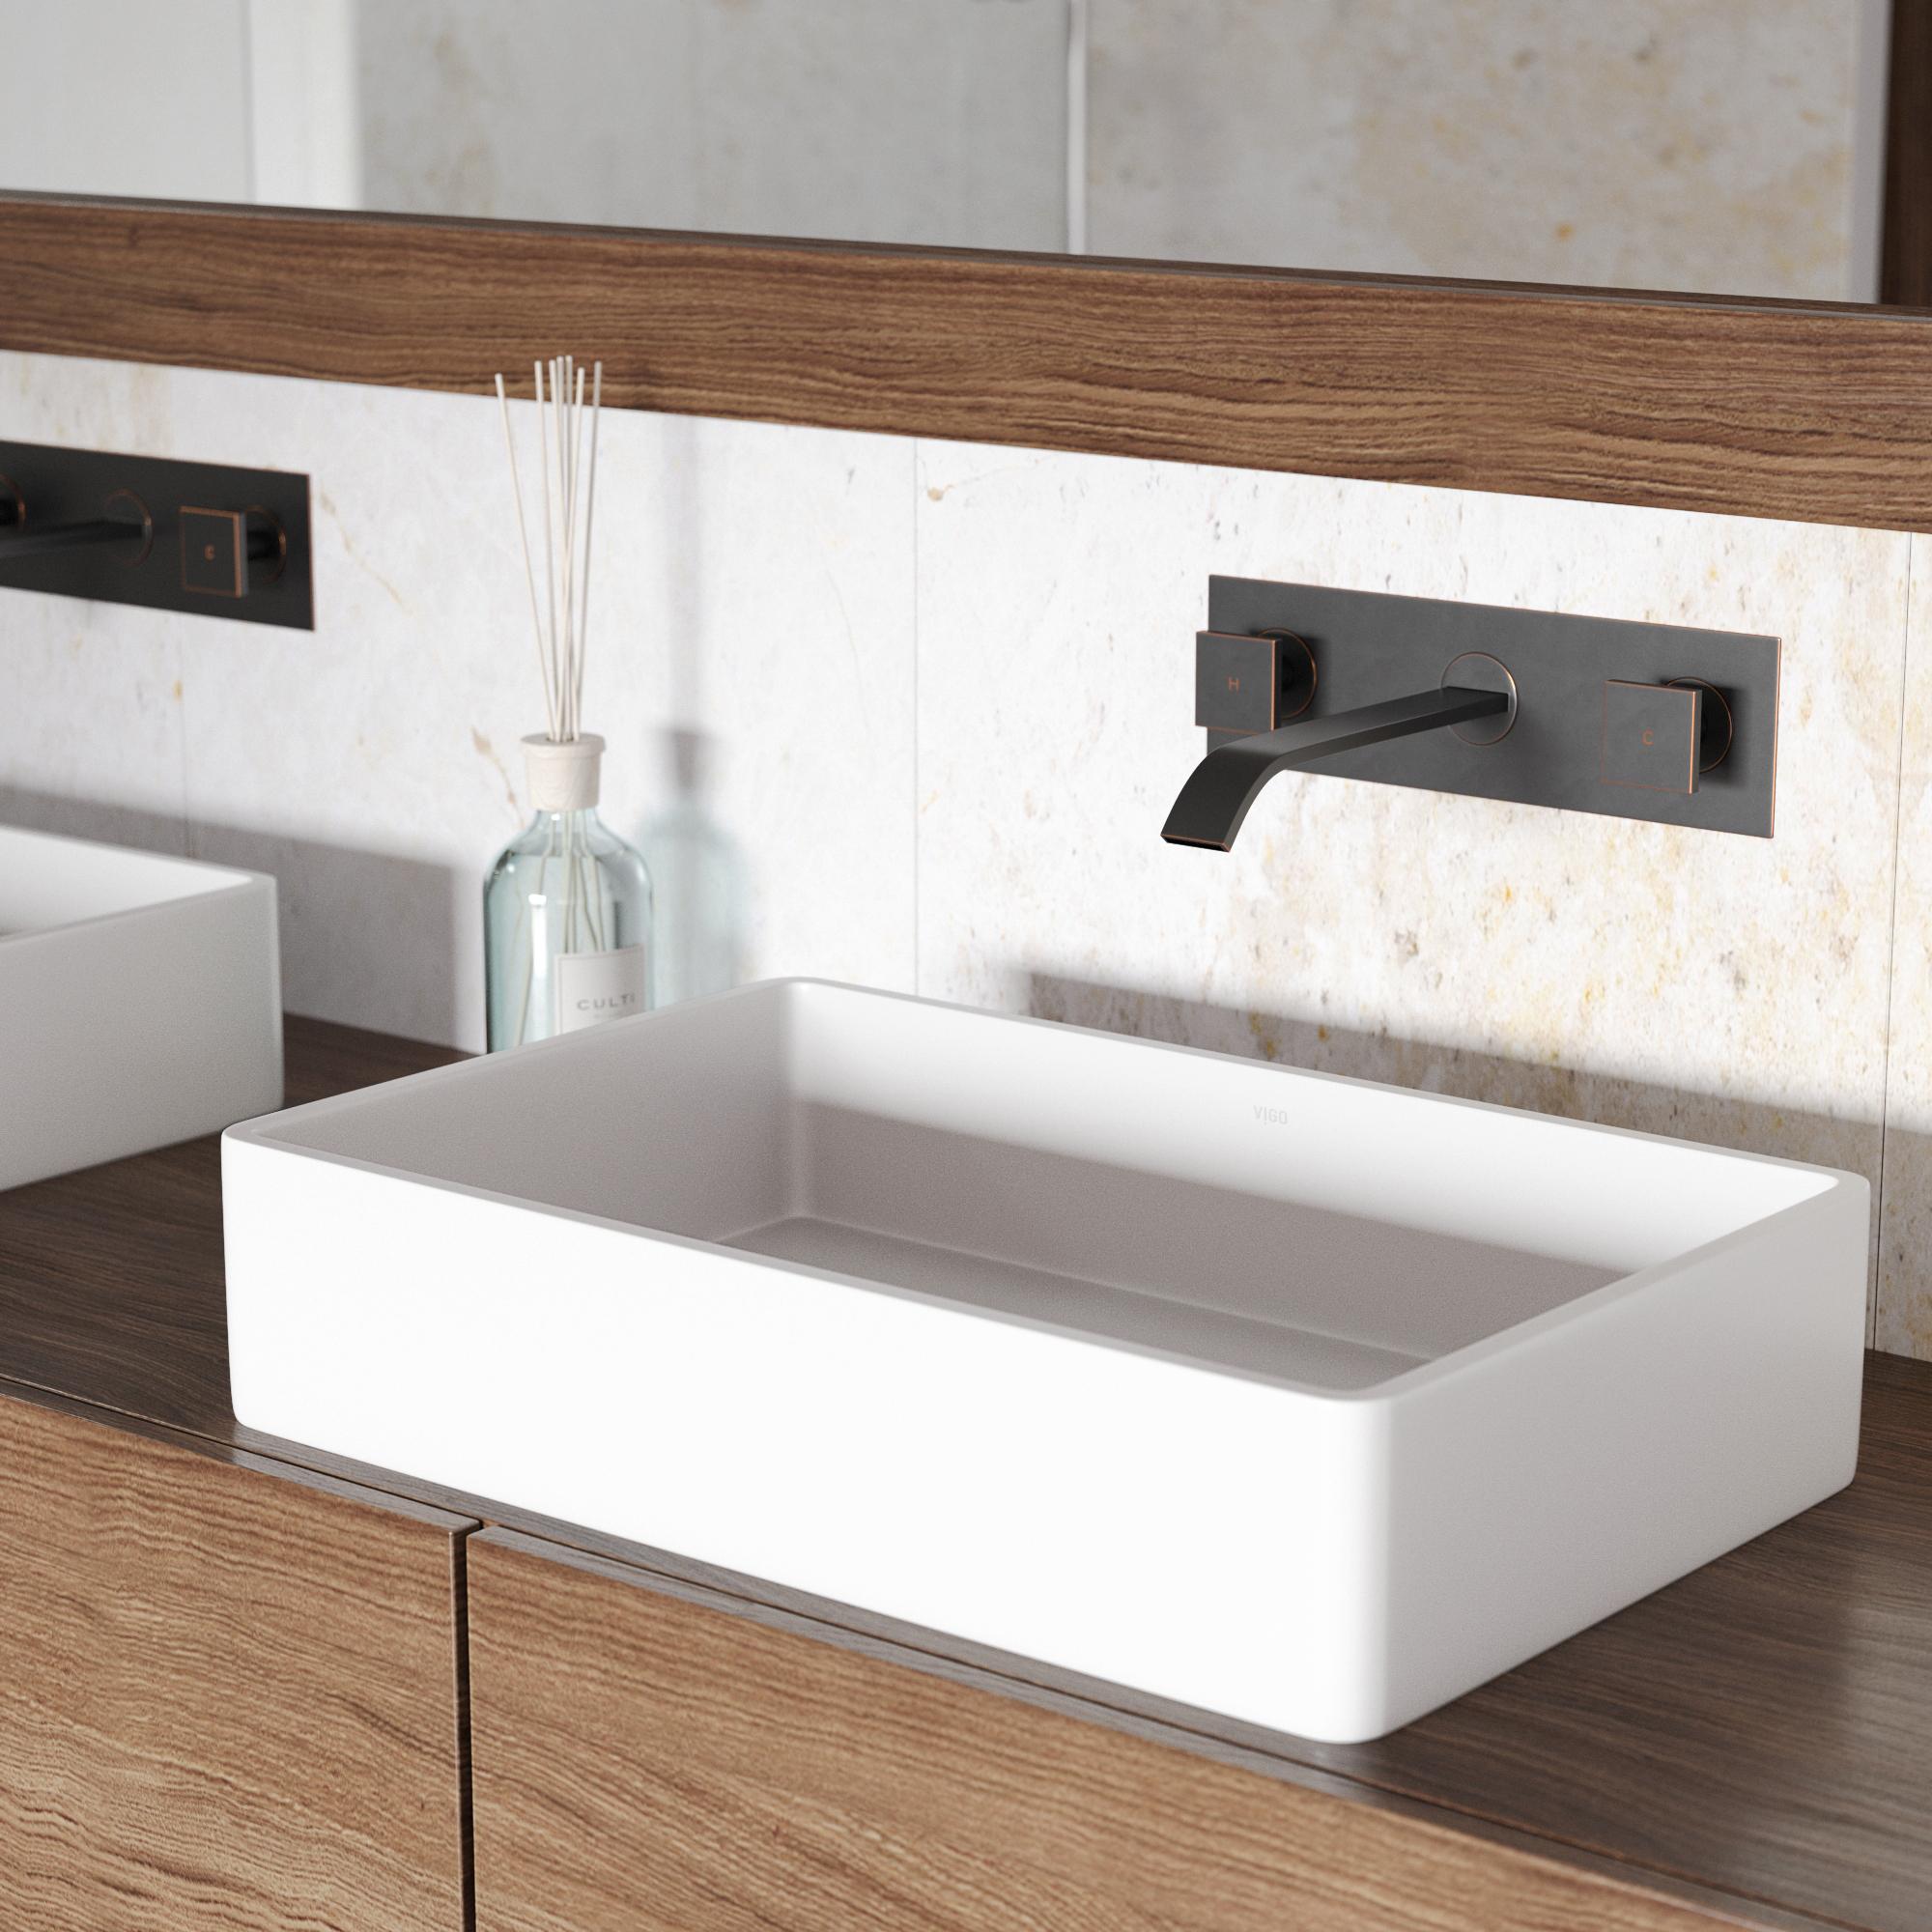 VIGO Magnolia Matte Stone Vessel Sink with Titus Wall Mount Faucet